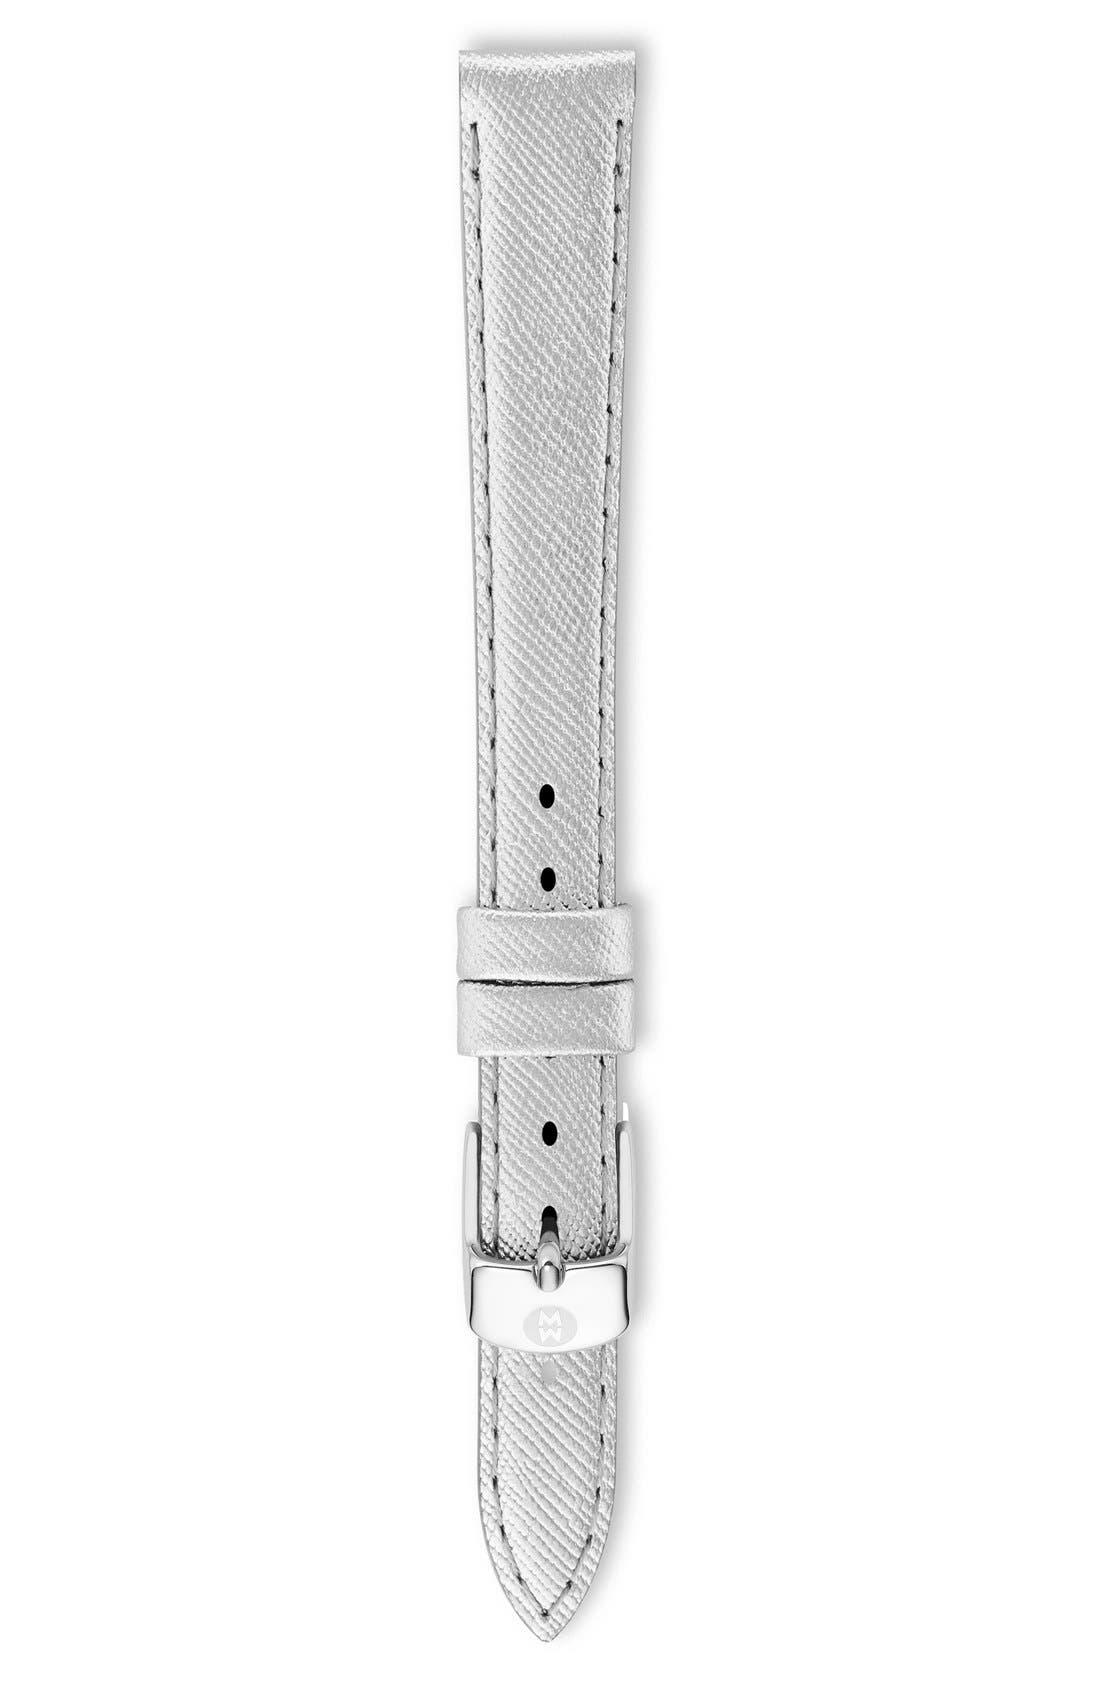 MICHELE 12mm Metallic Leather Watch Strap